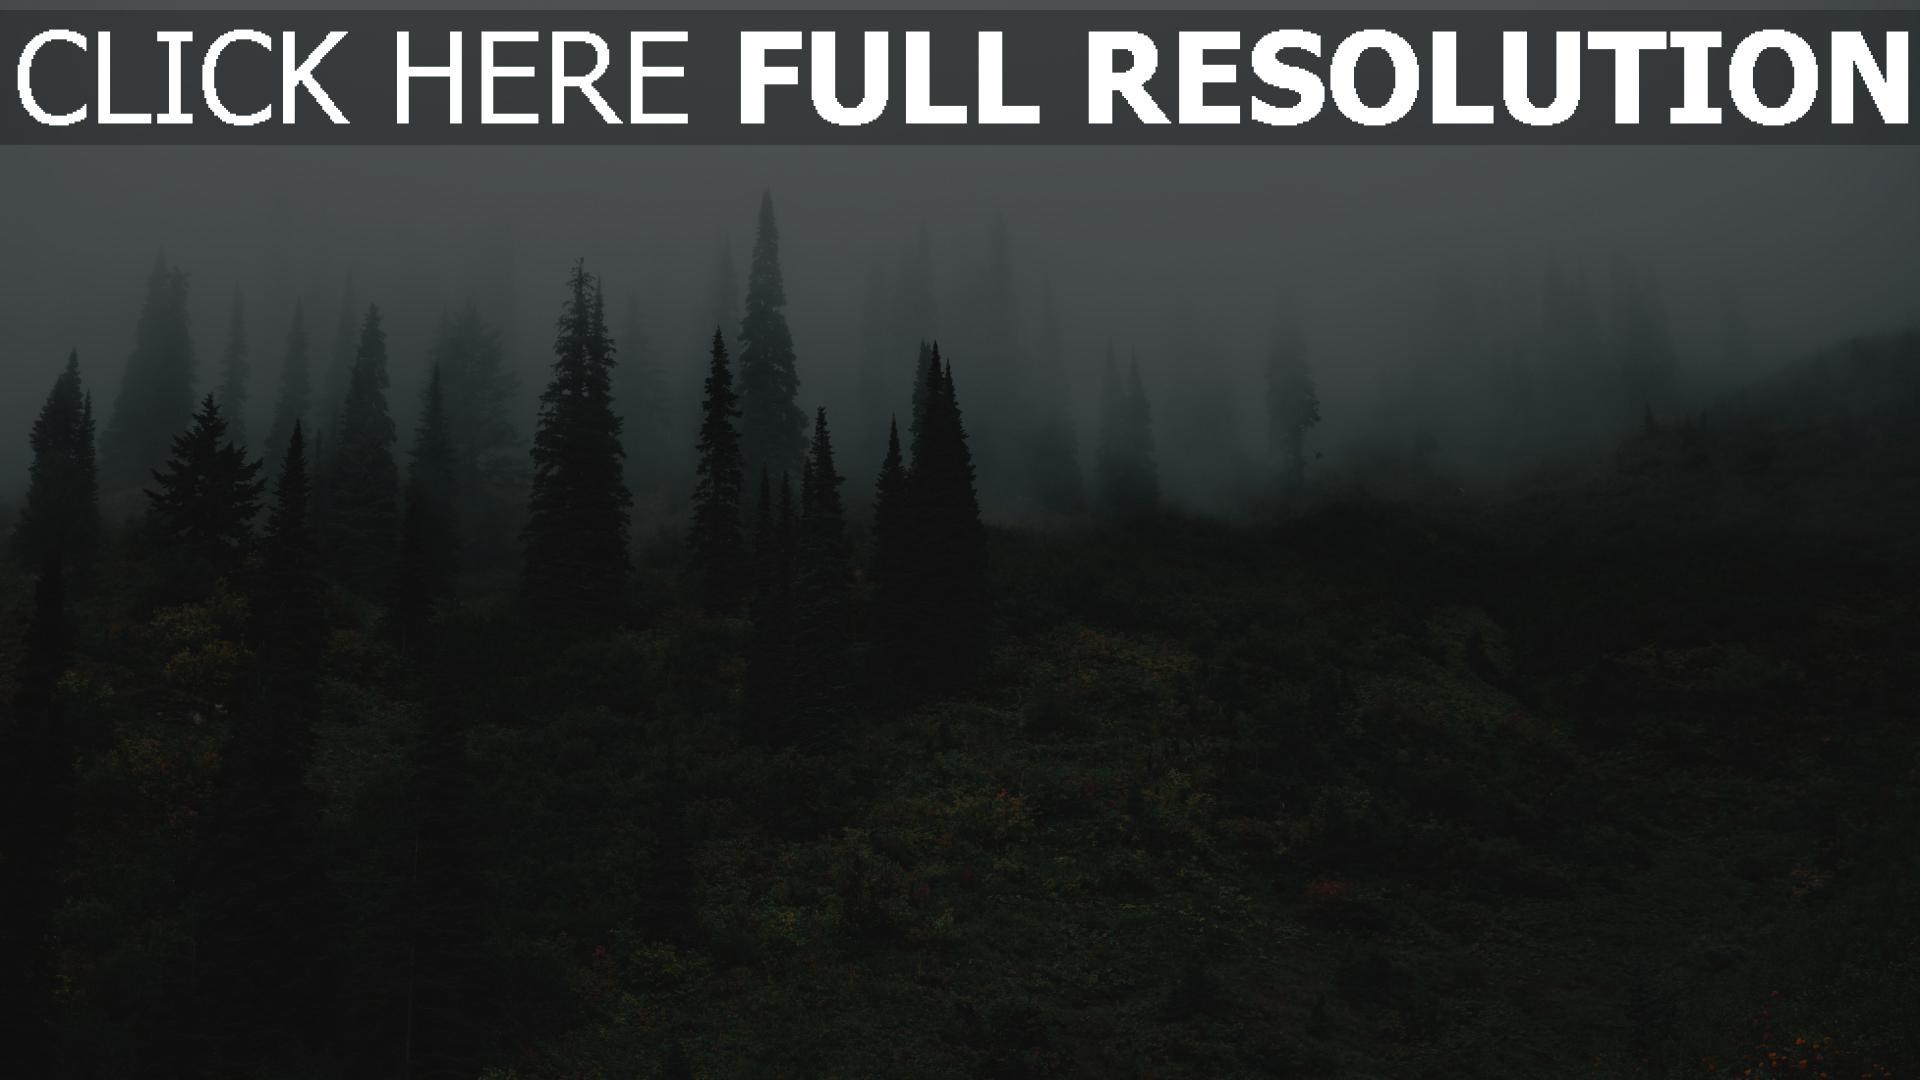 hd hintergrundbilder gras bäume nebel 1920x1080